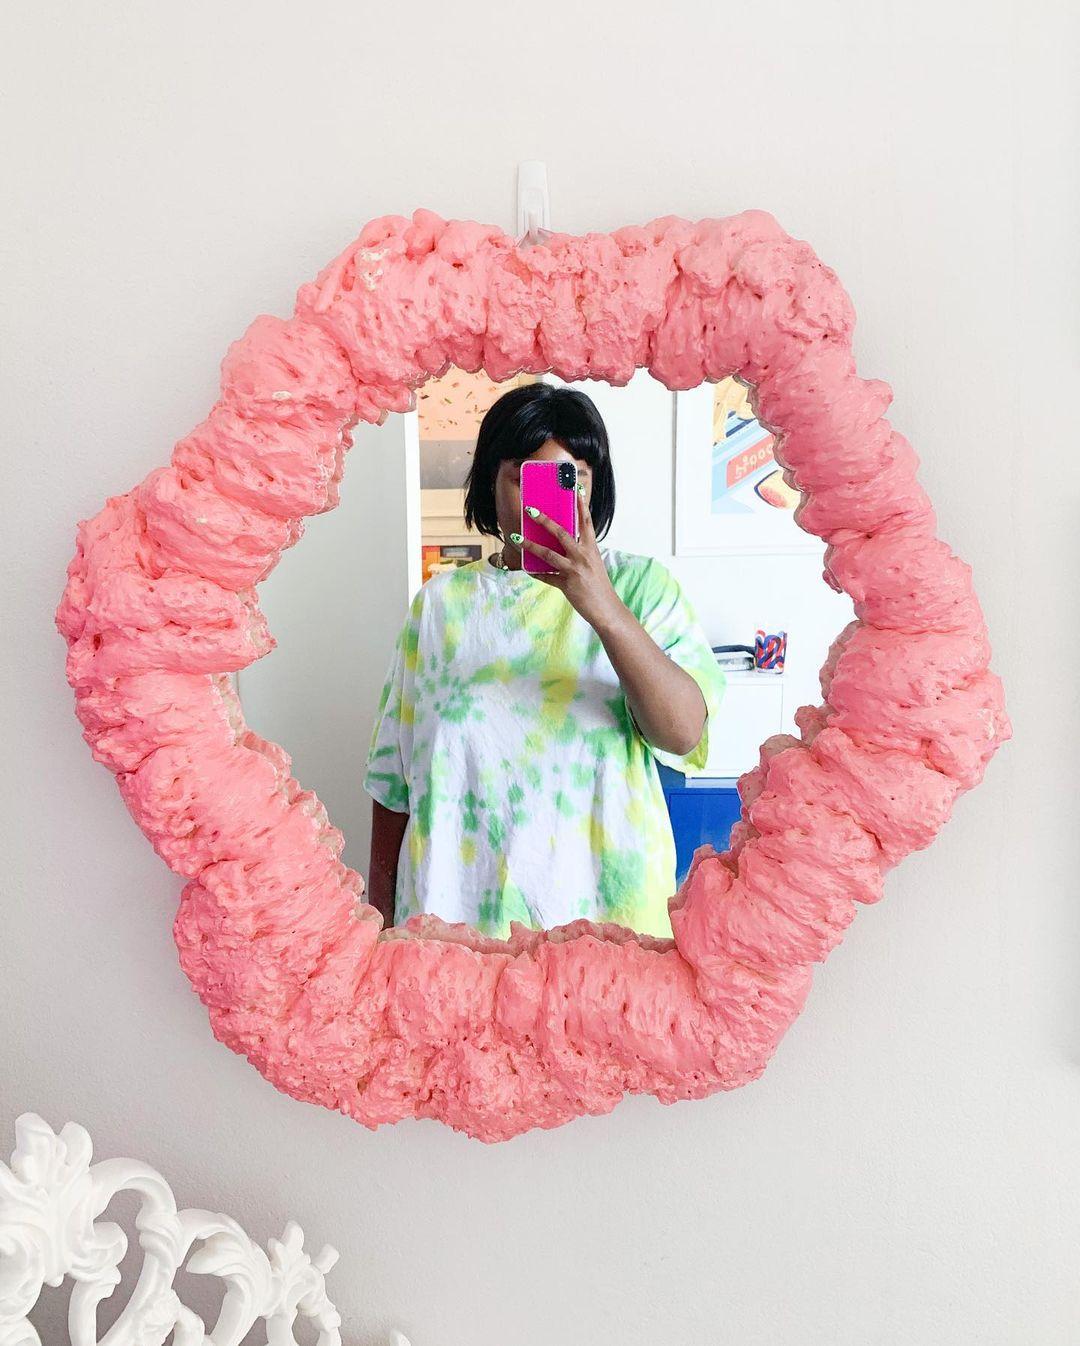 The foam mirror trend started on Instagram